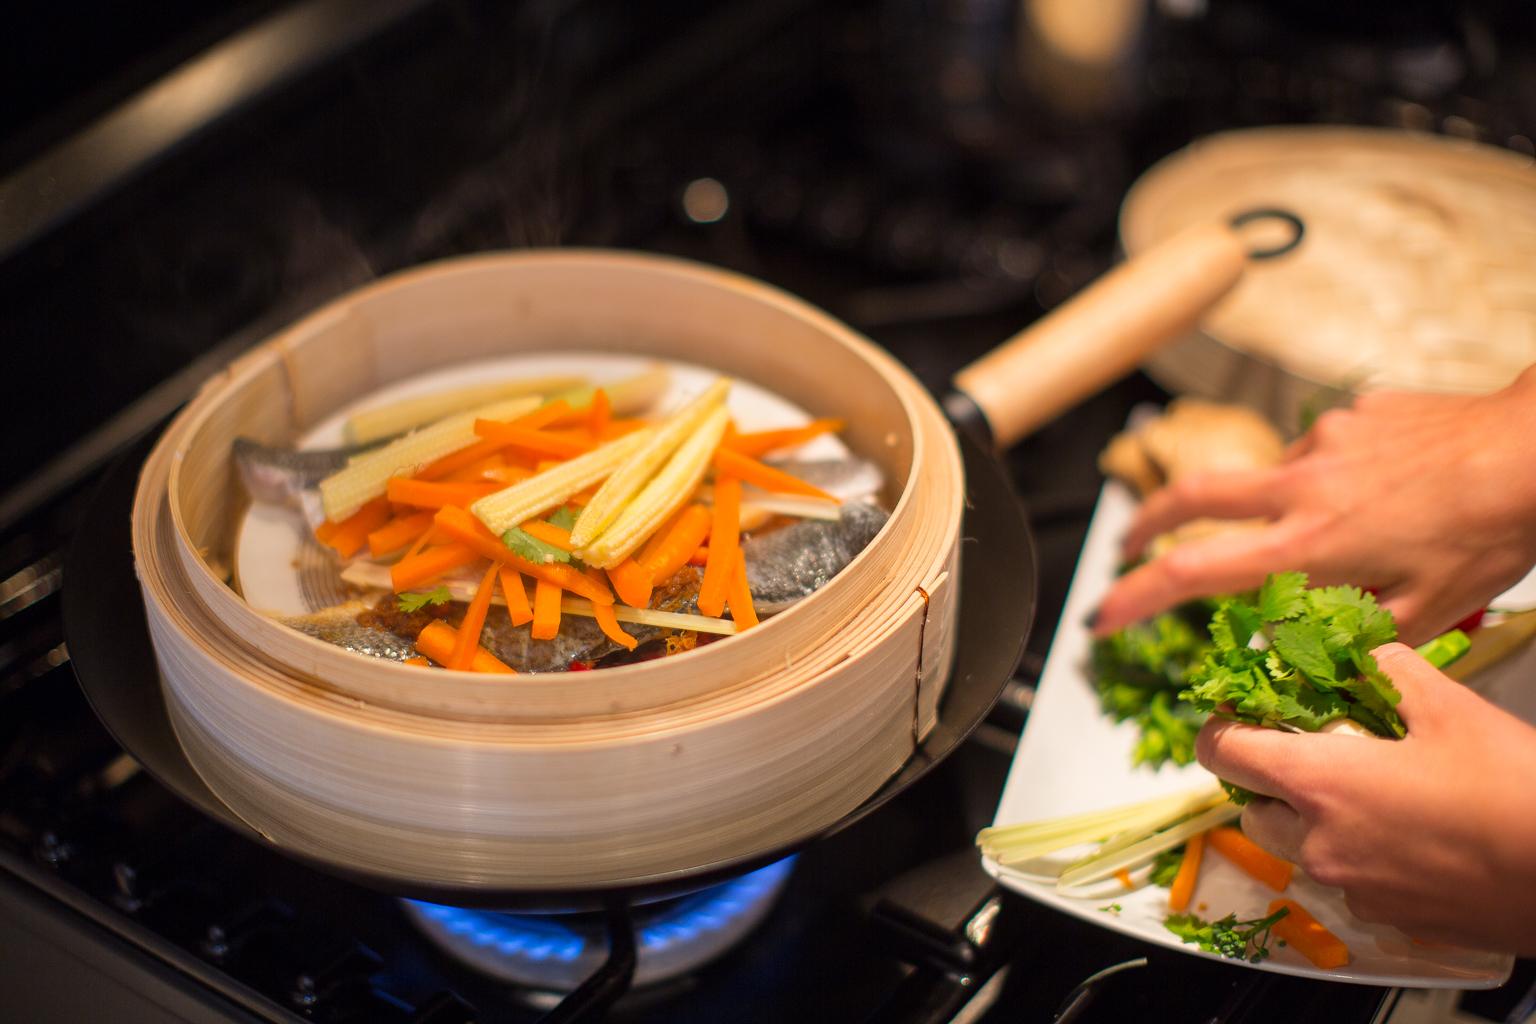 Fitness On Toast Faya Blog Girl Healthy Recipe Inspiratino Fish Steamed Seabass Ginger Carrot Wok Basket Bamboo Steam Diet Light-4